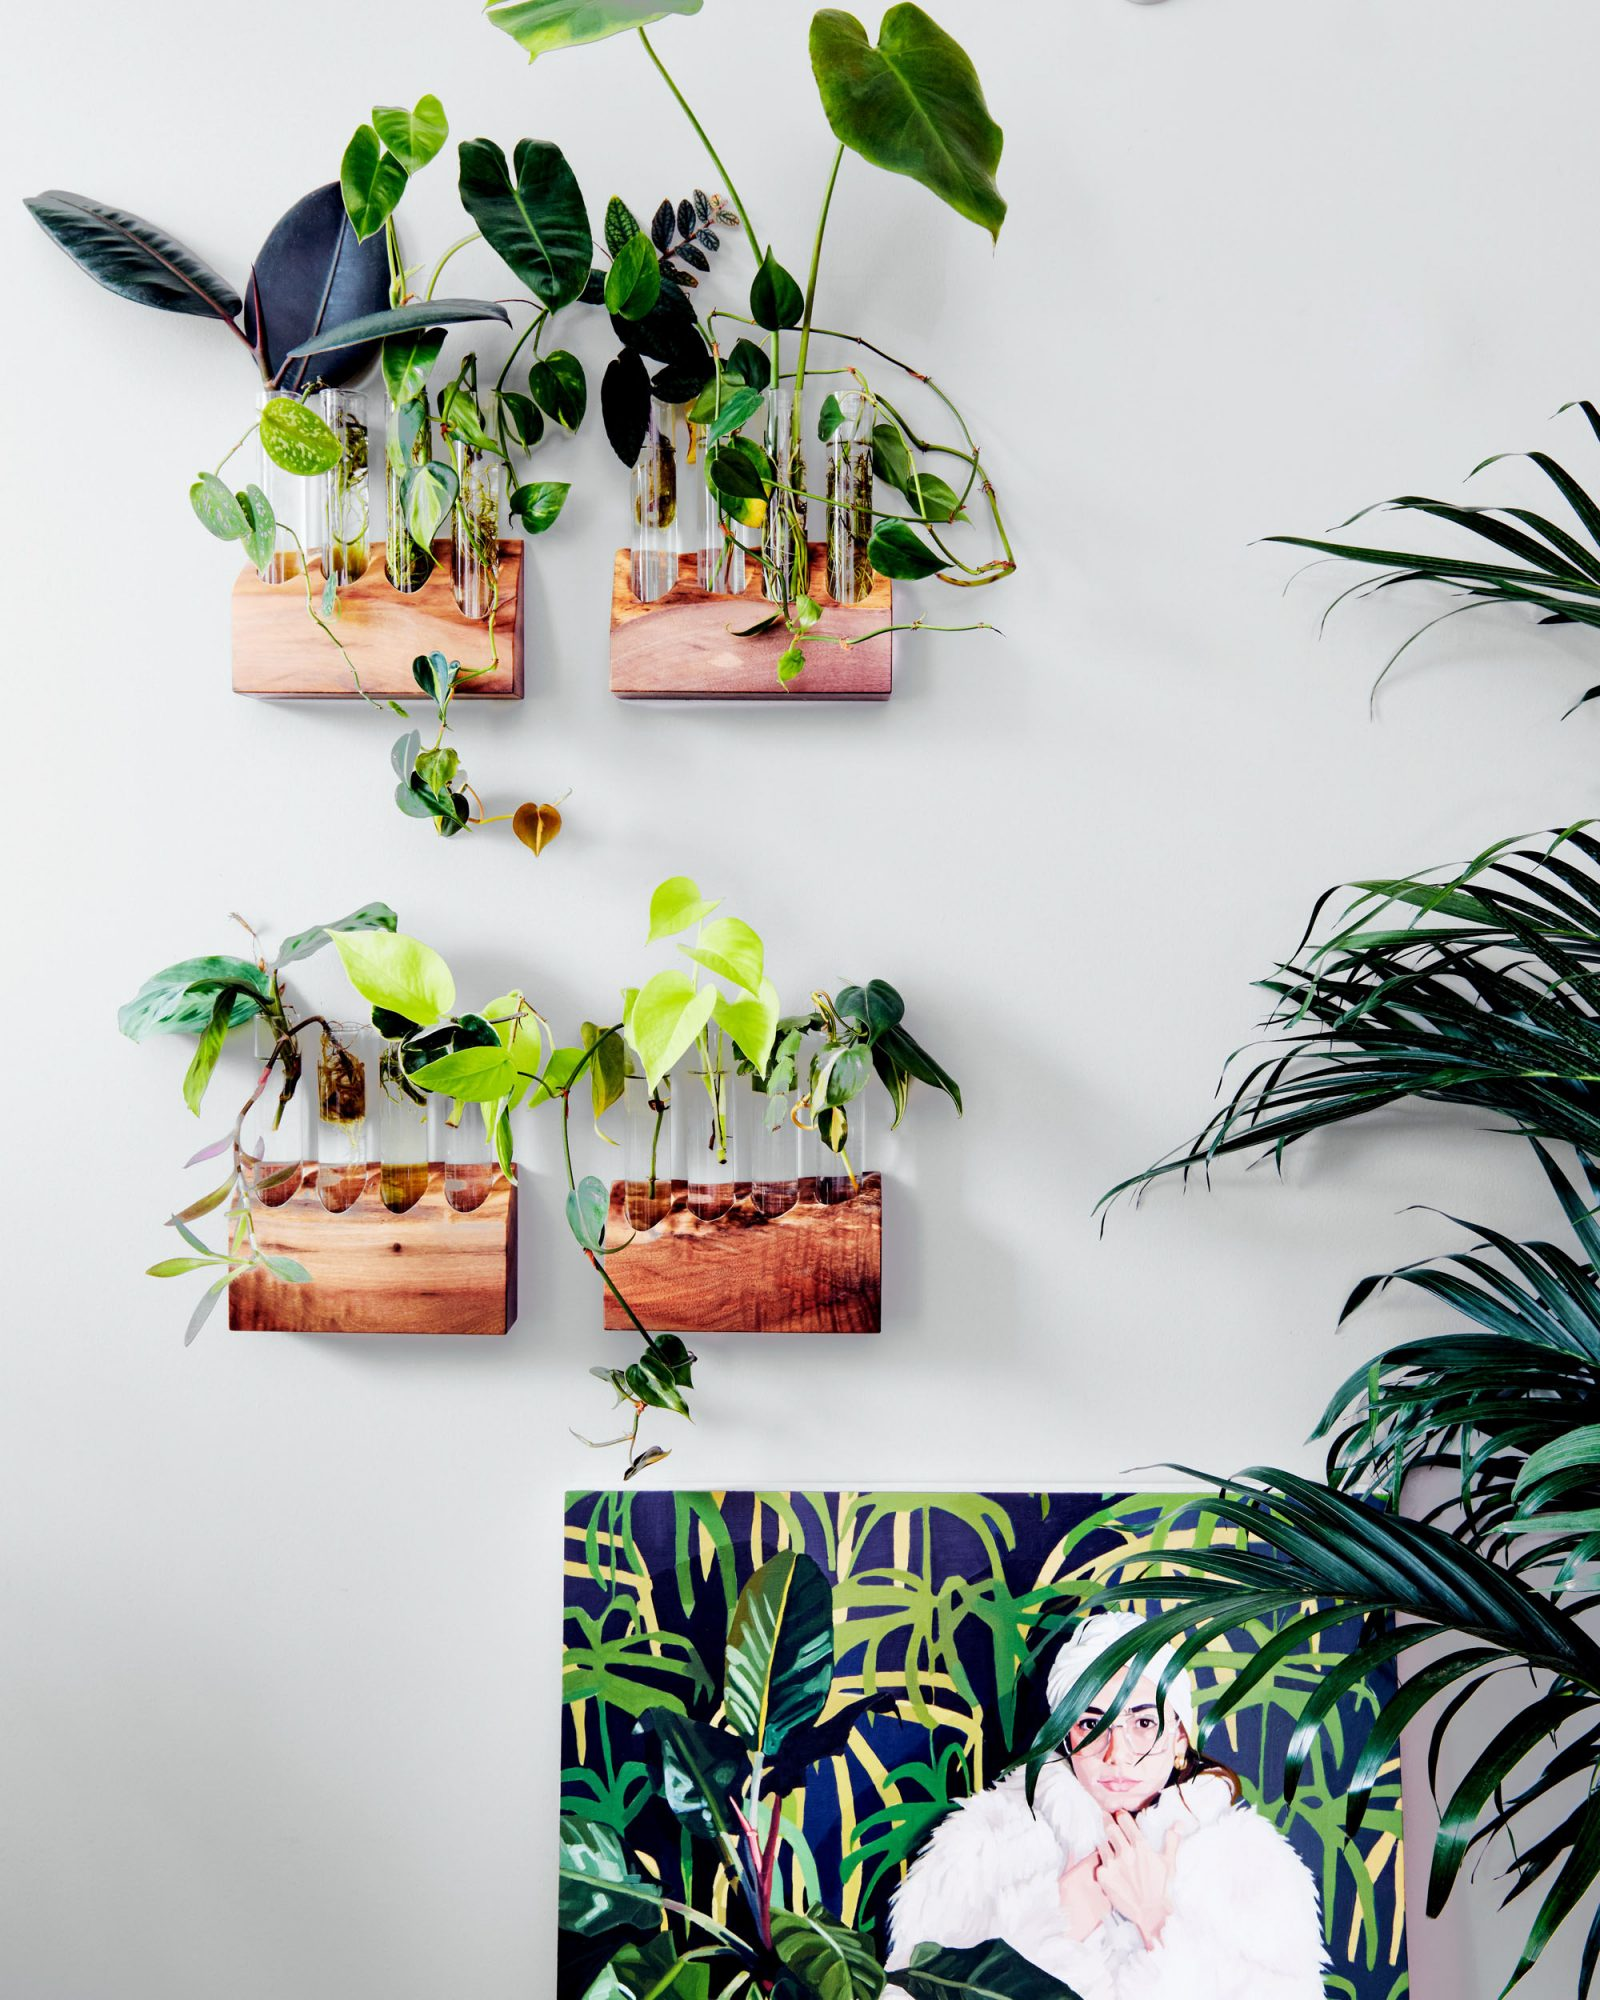 plant cuttings growing on custom display living wall